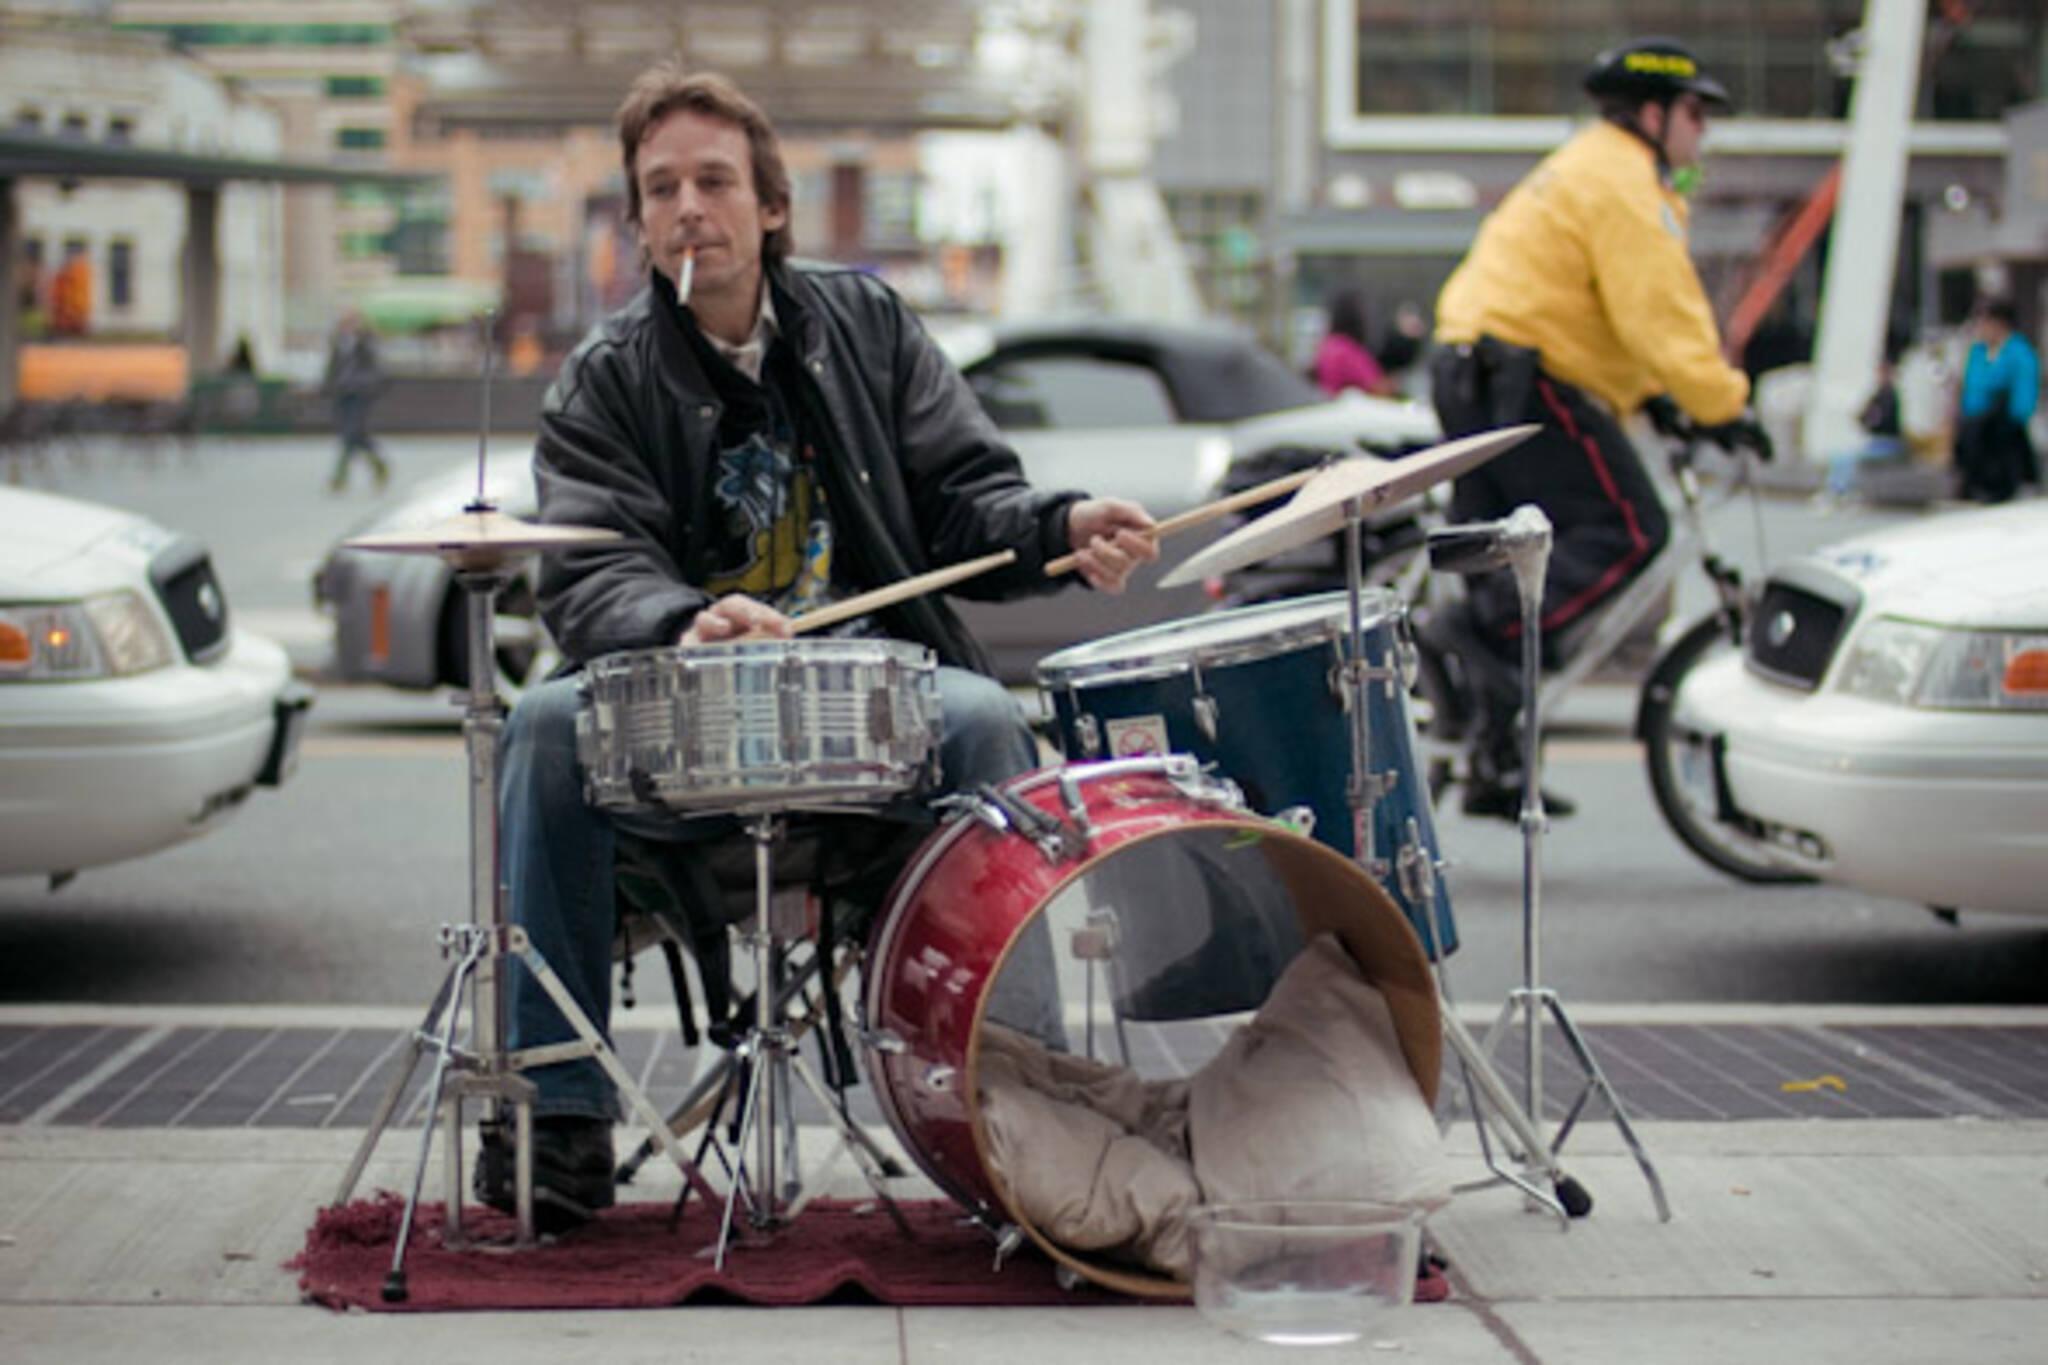 Toronto Street Busker Peter Richards